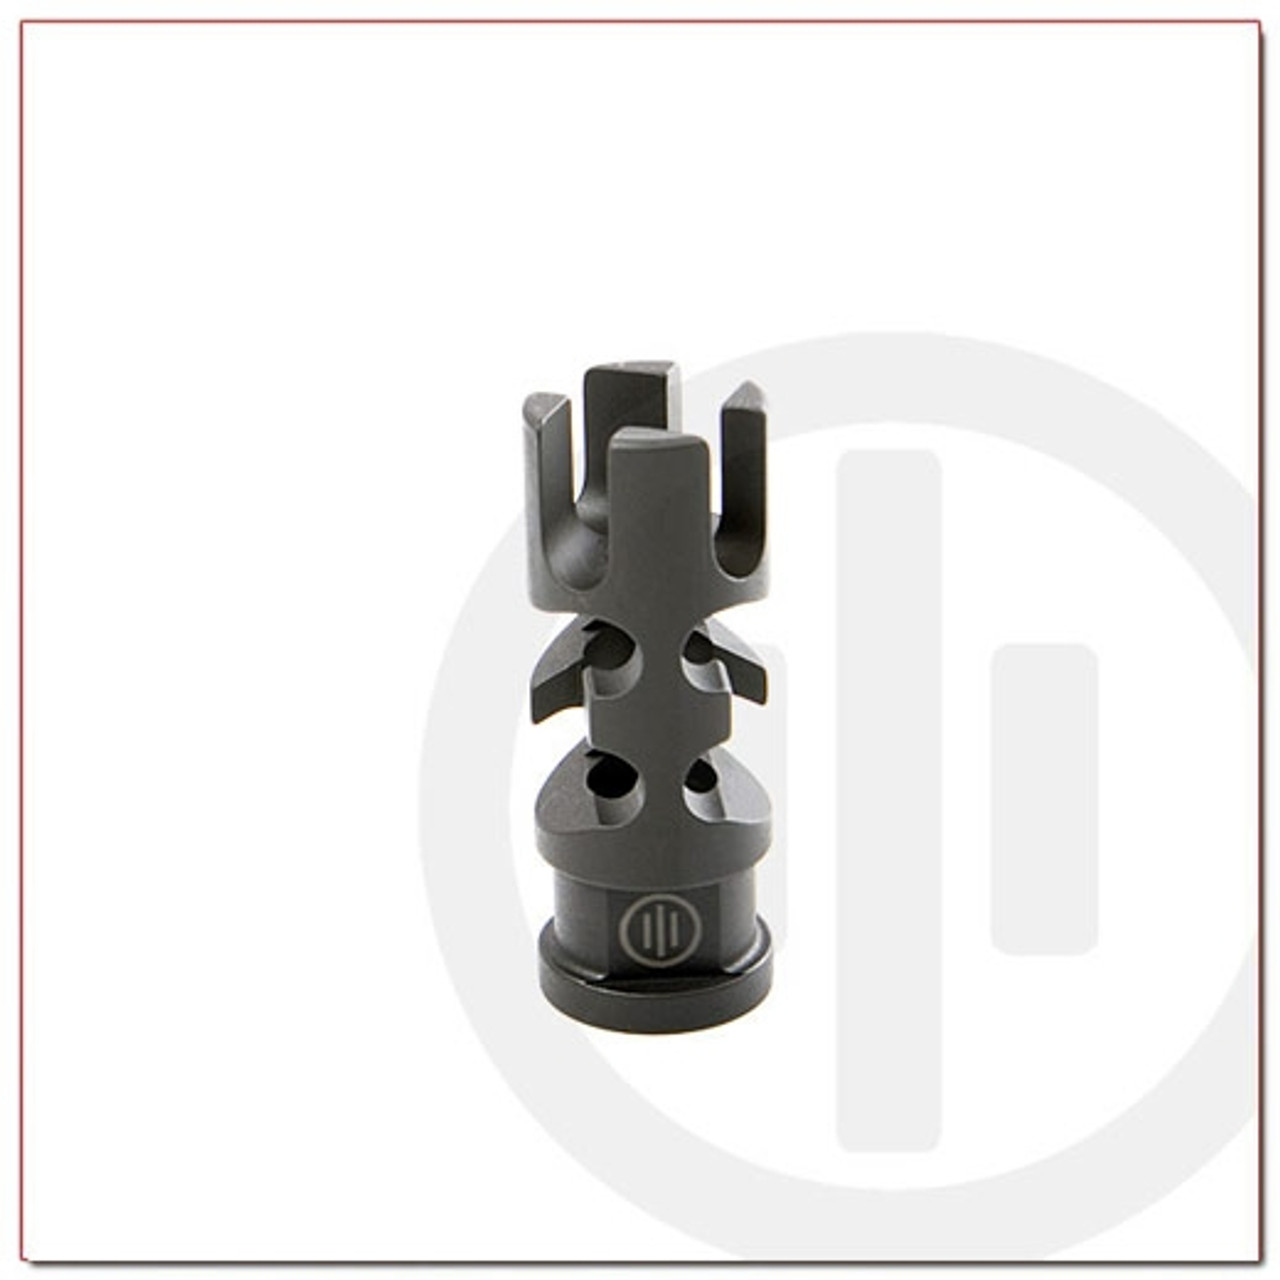 PWS - FSC556 Compensator